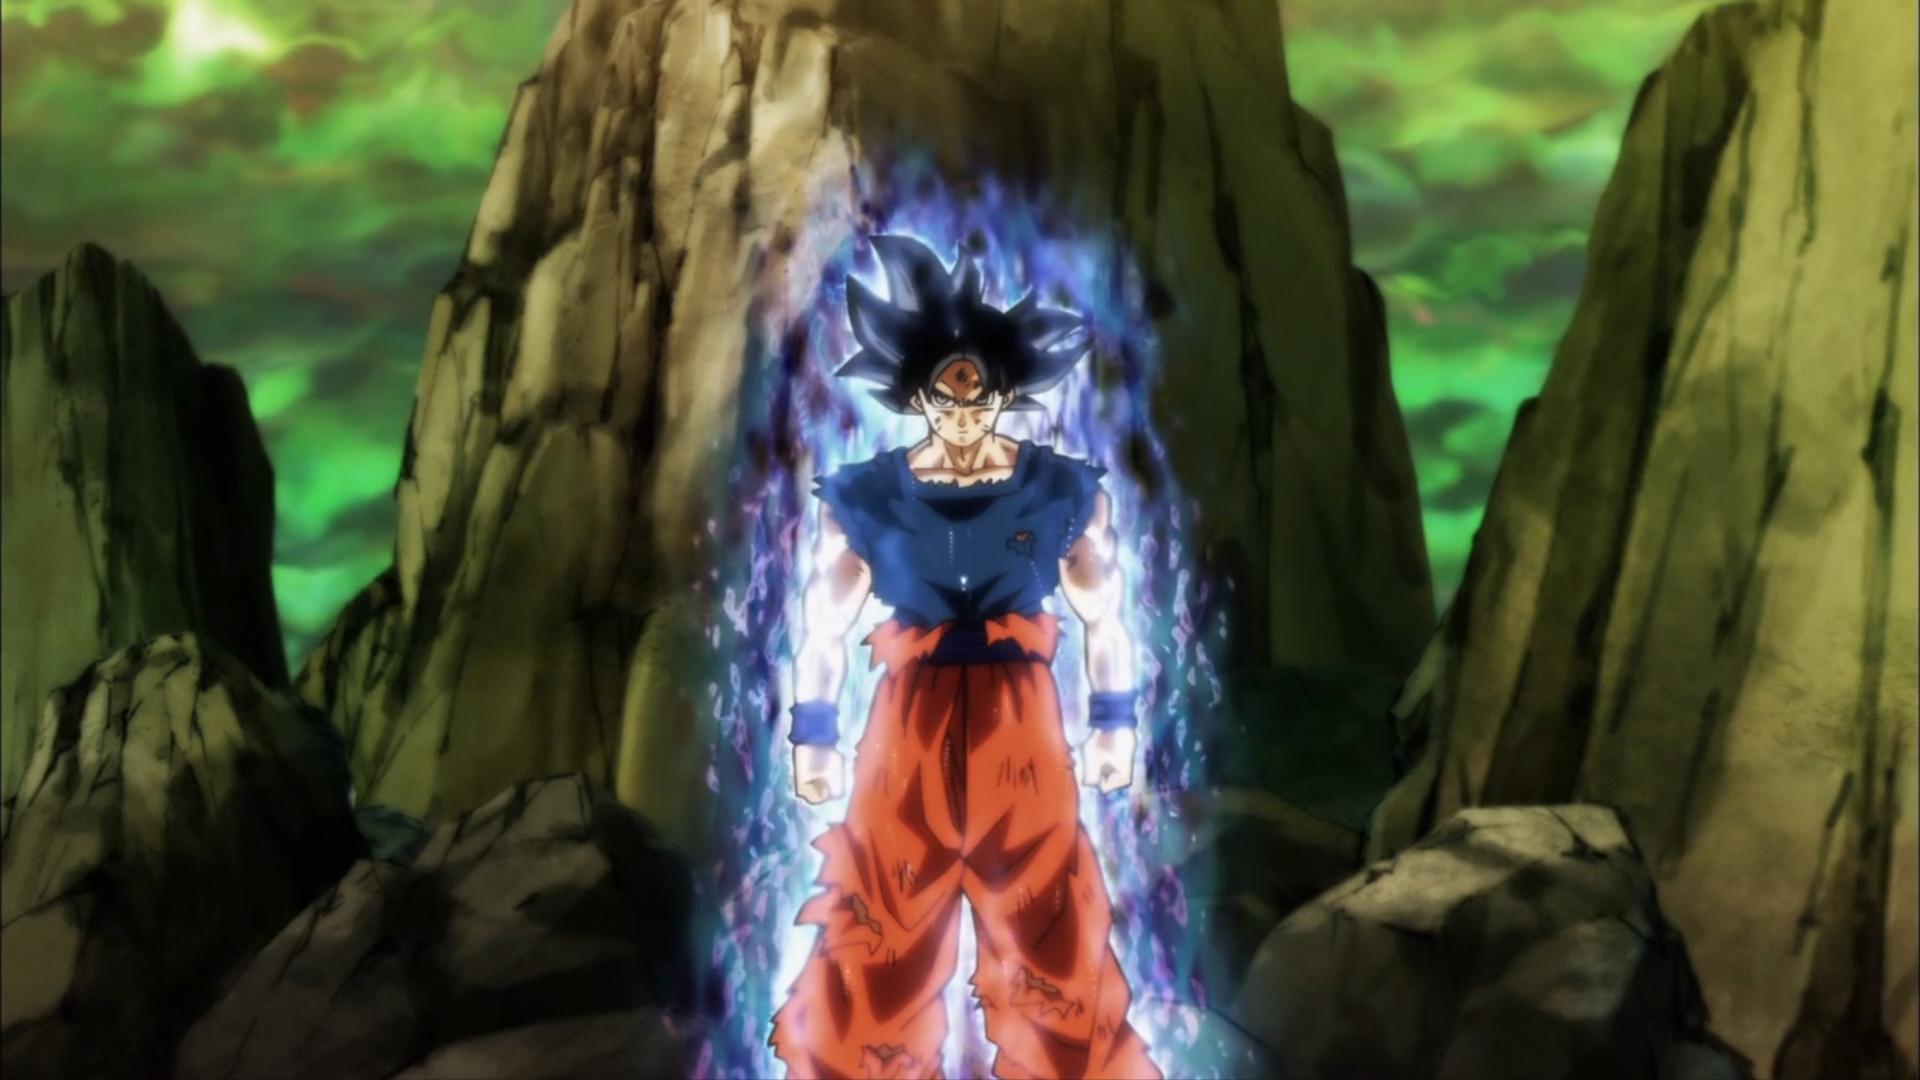 Goku Ultra Instinct Hd Wallpaper Background Image 1920x1080